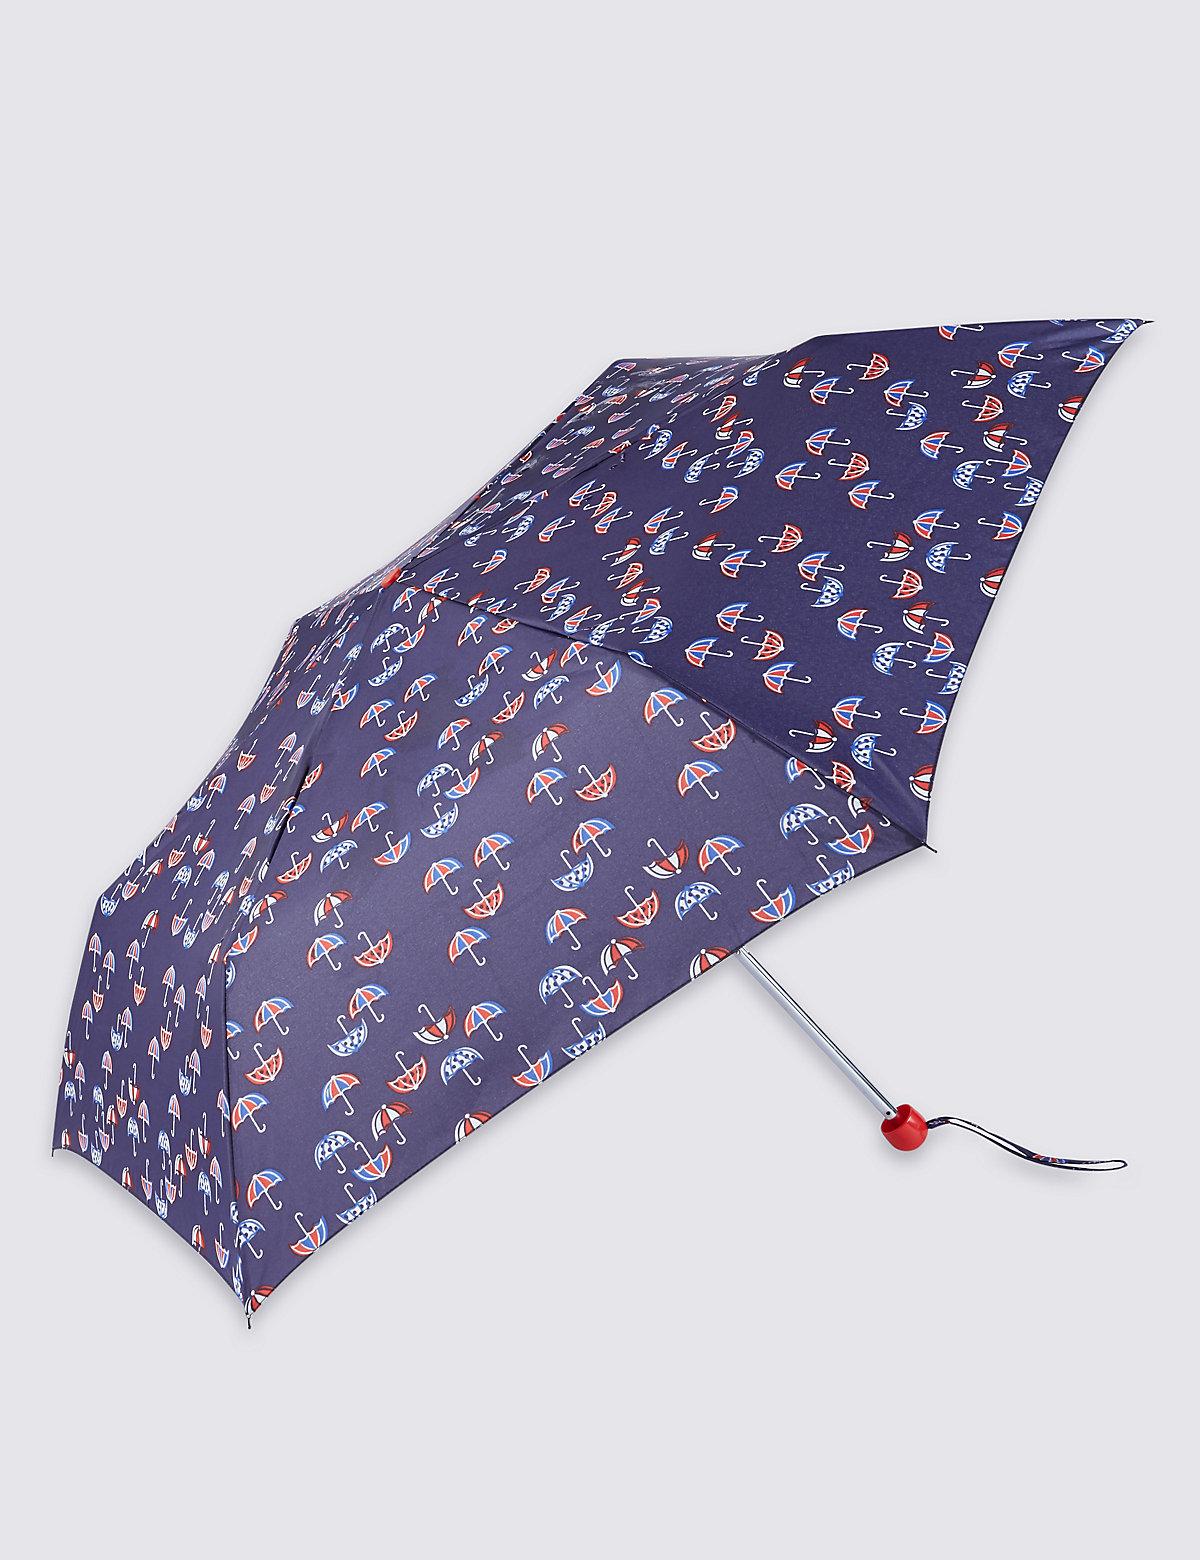 M&S Collection Mini Umbrella Print Compact Umbrella with Stormwear